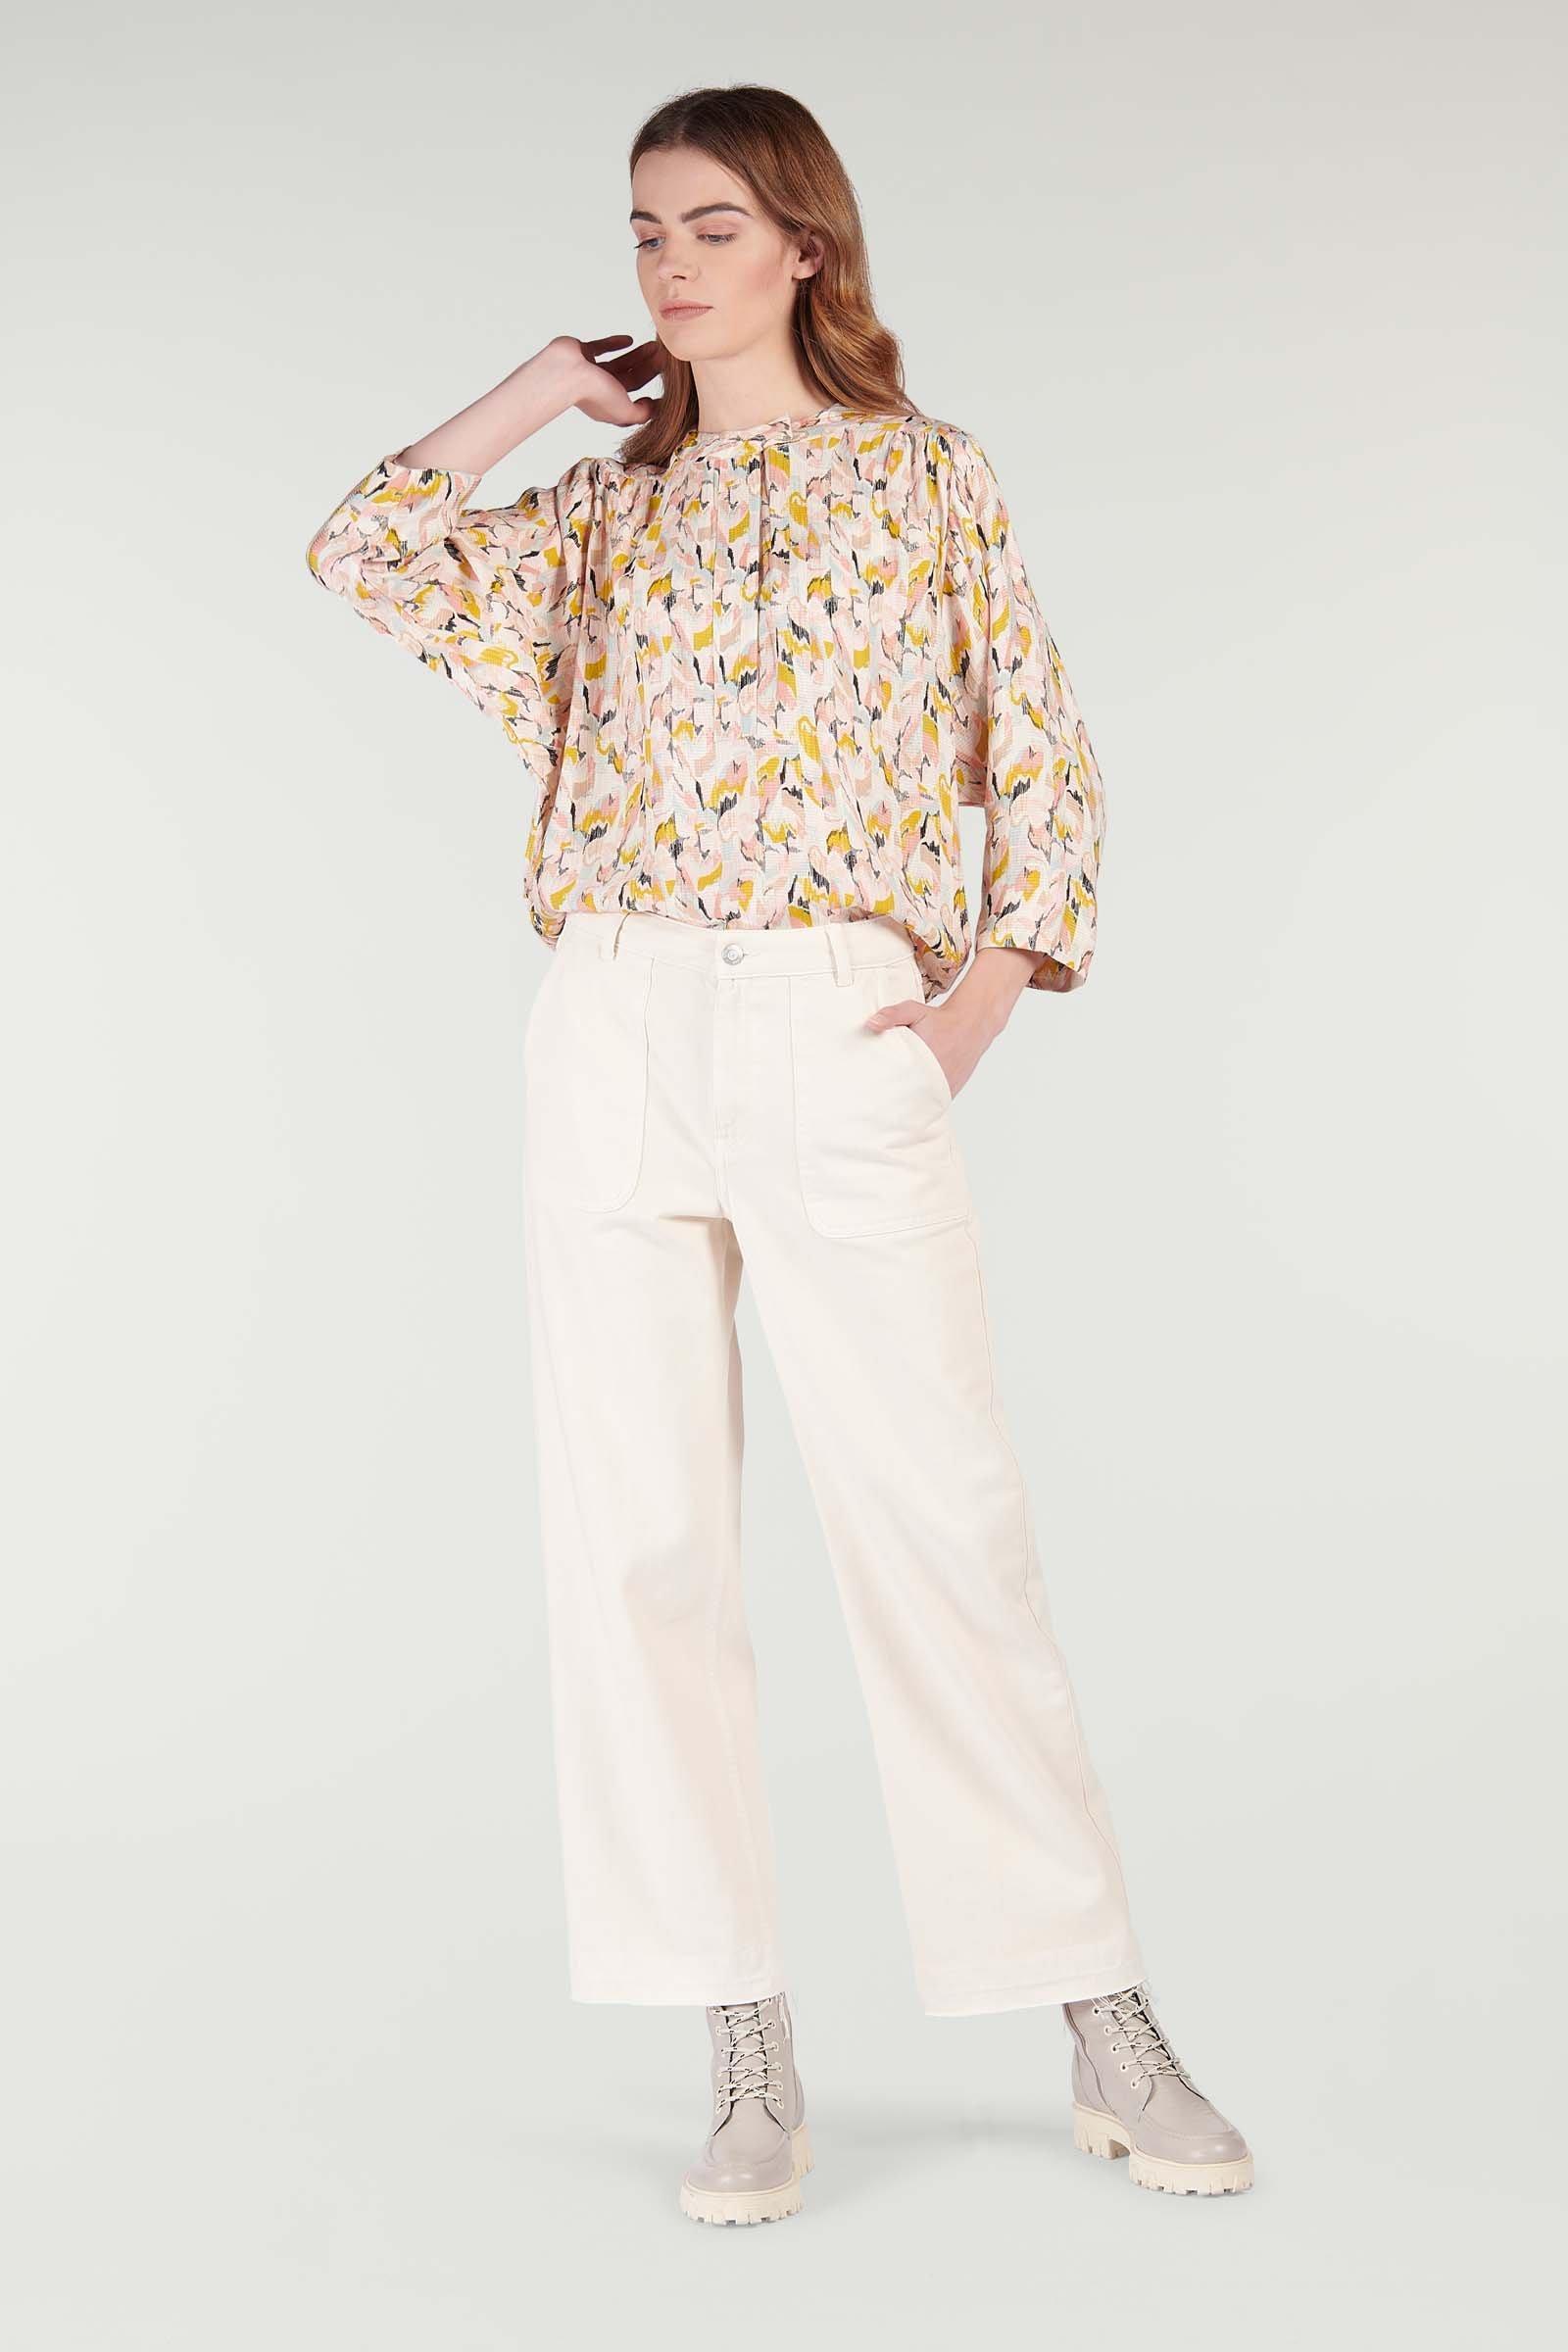 https://webmedia.cks-fashion.com/i/cks/123317ASM_10_l_model